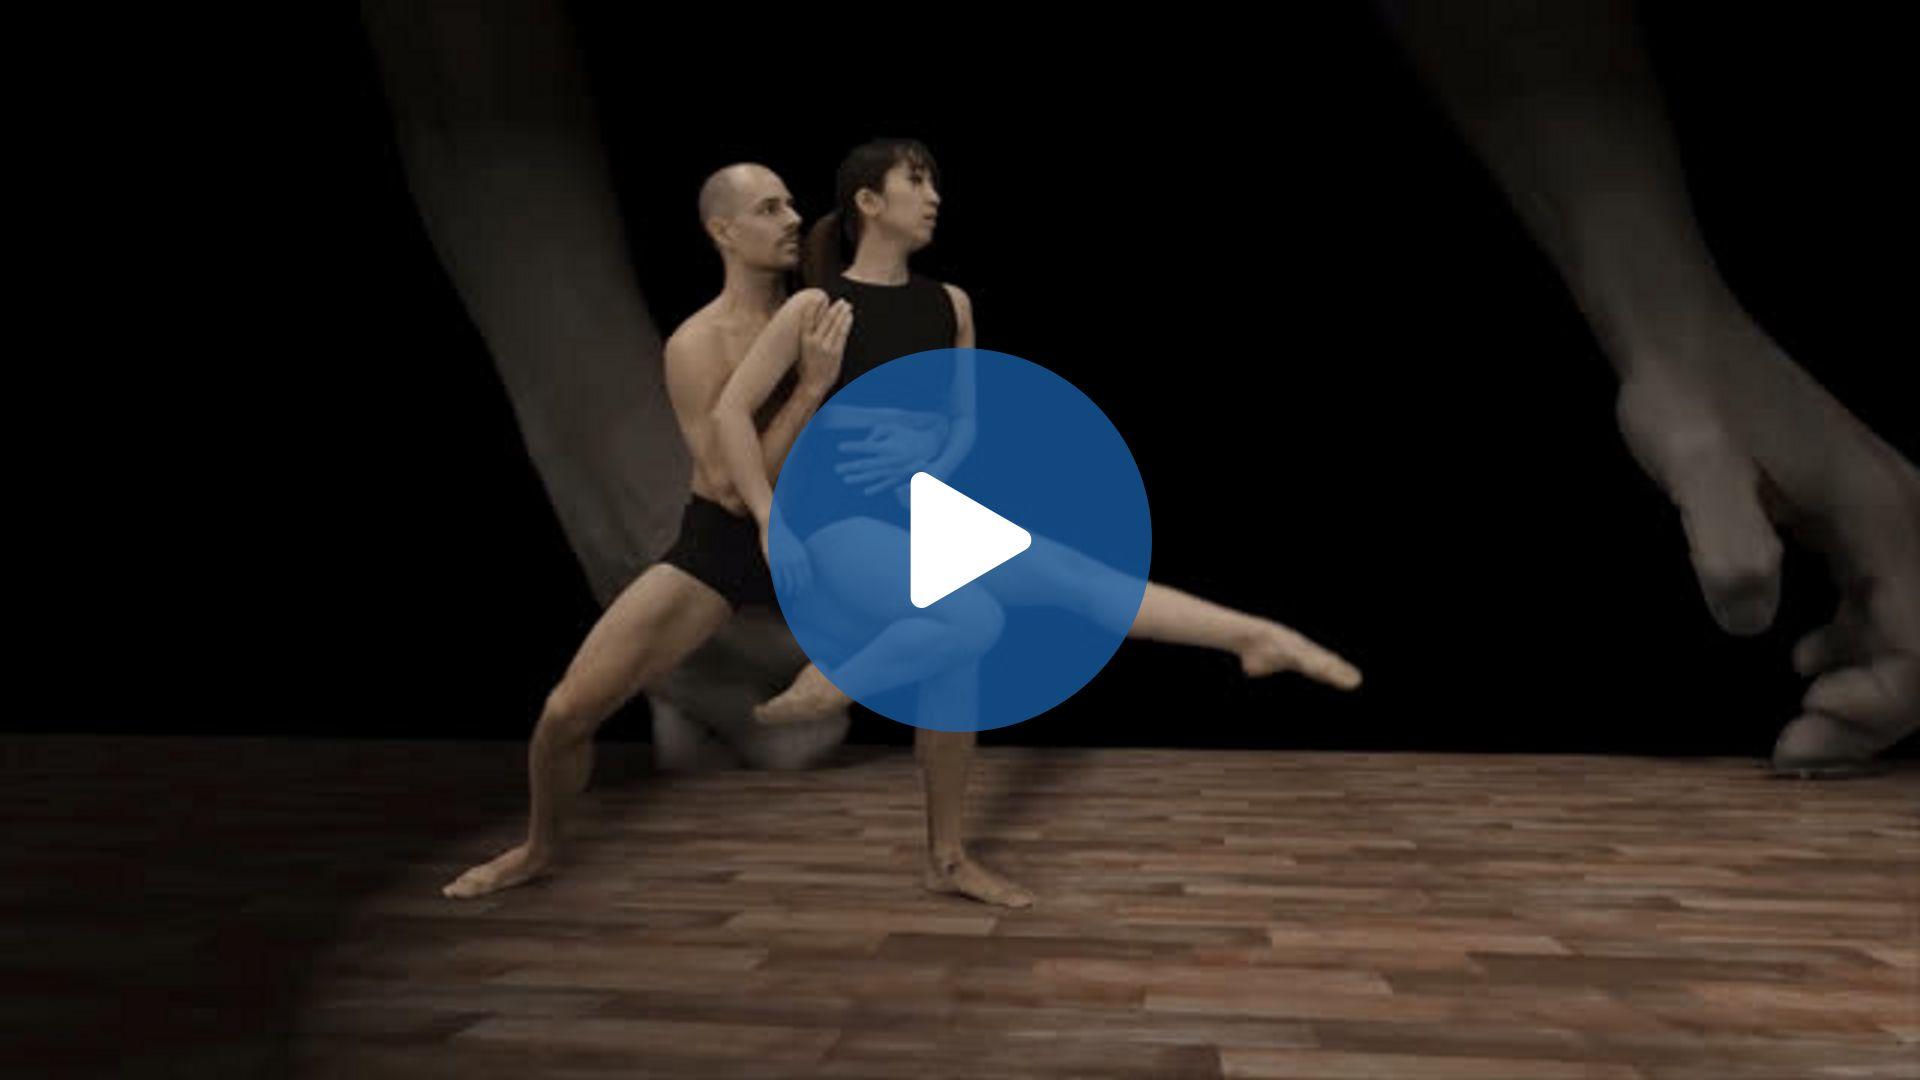 AKOB - The Great Escape